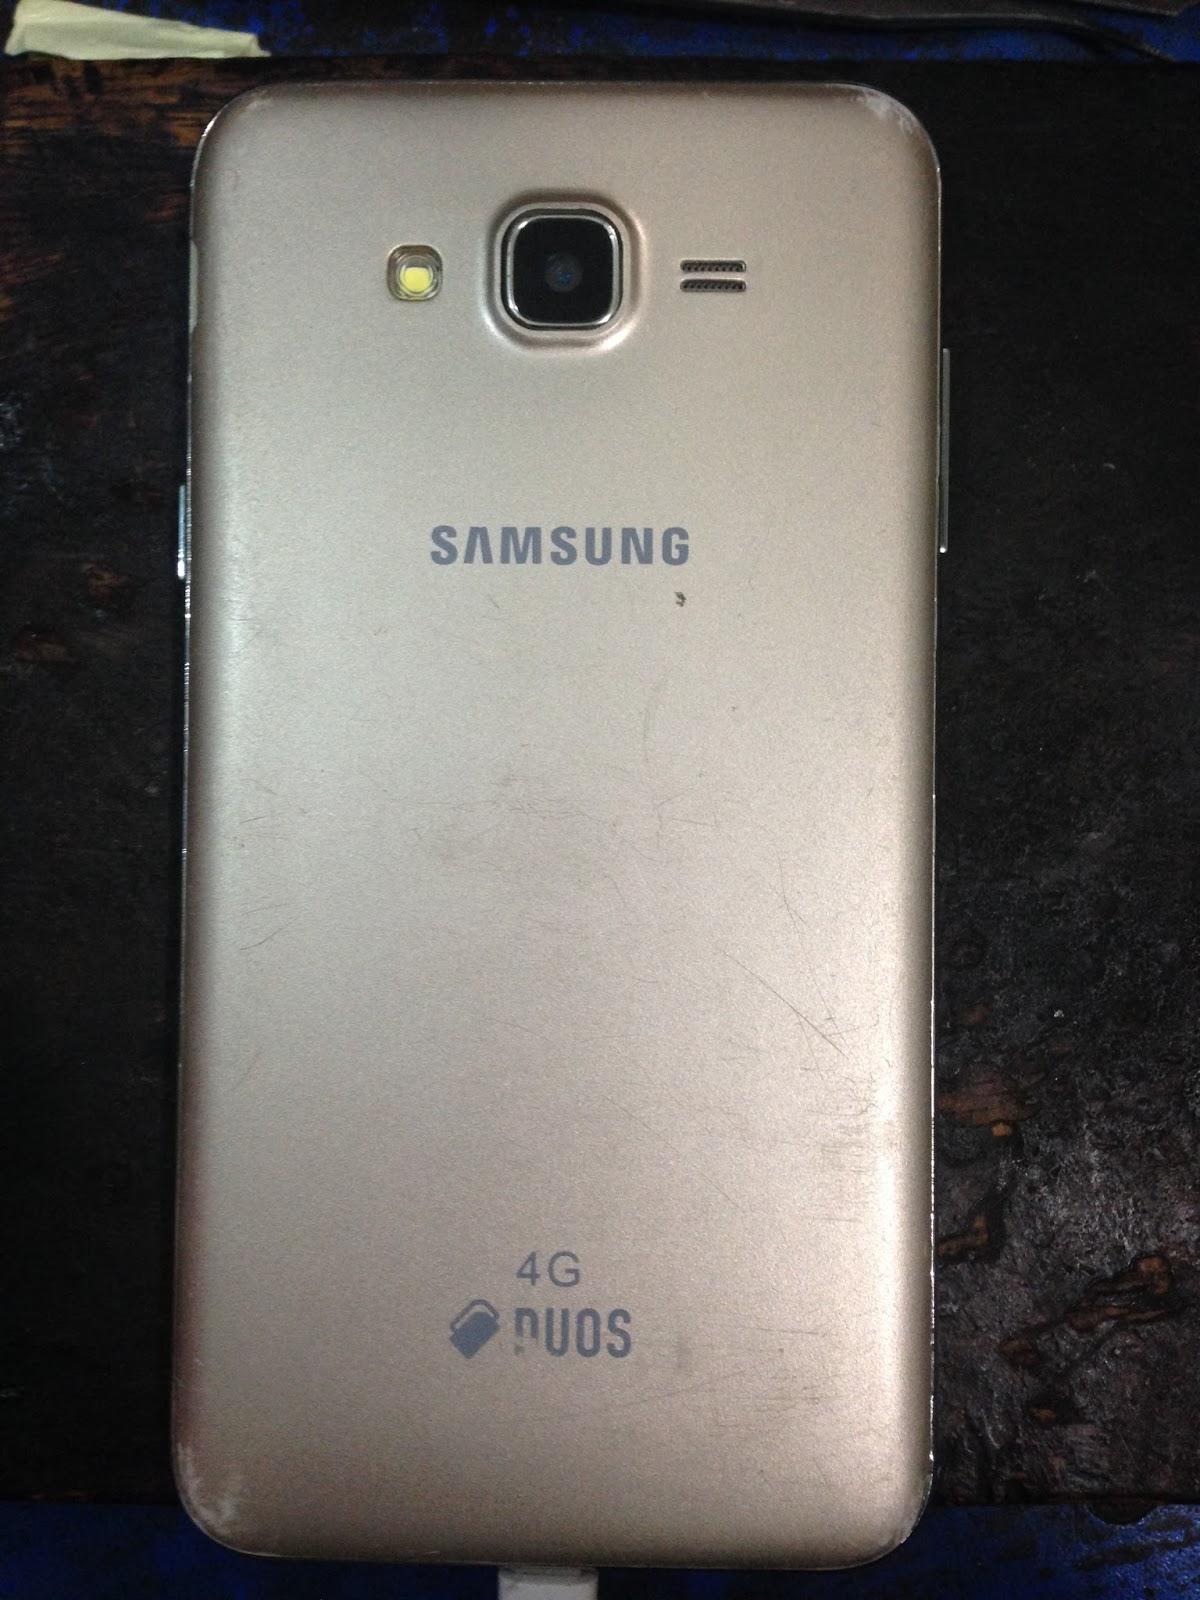 Samsung j700h firmware - Mt6572__samsung__sm J700h__j73g__5 1 1__alps Jb3 Mp V1 Preloader_e118_lca 100kb